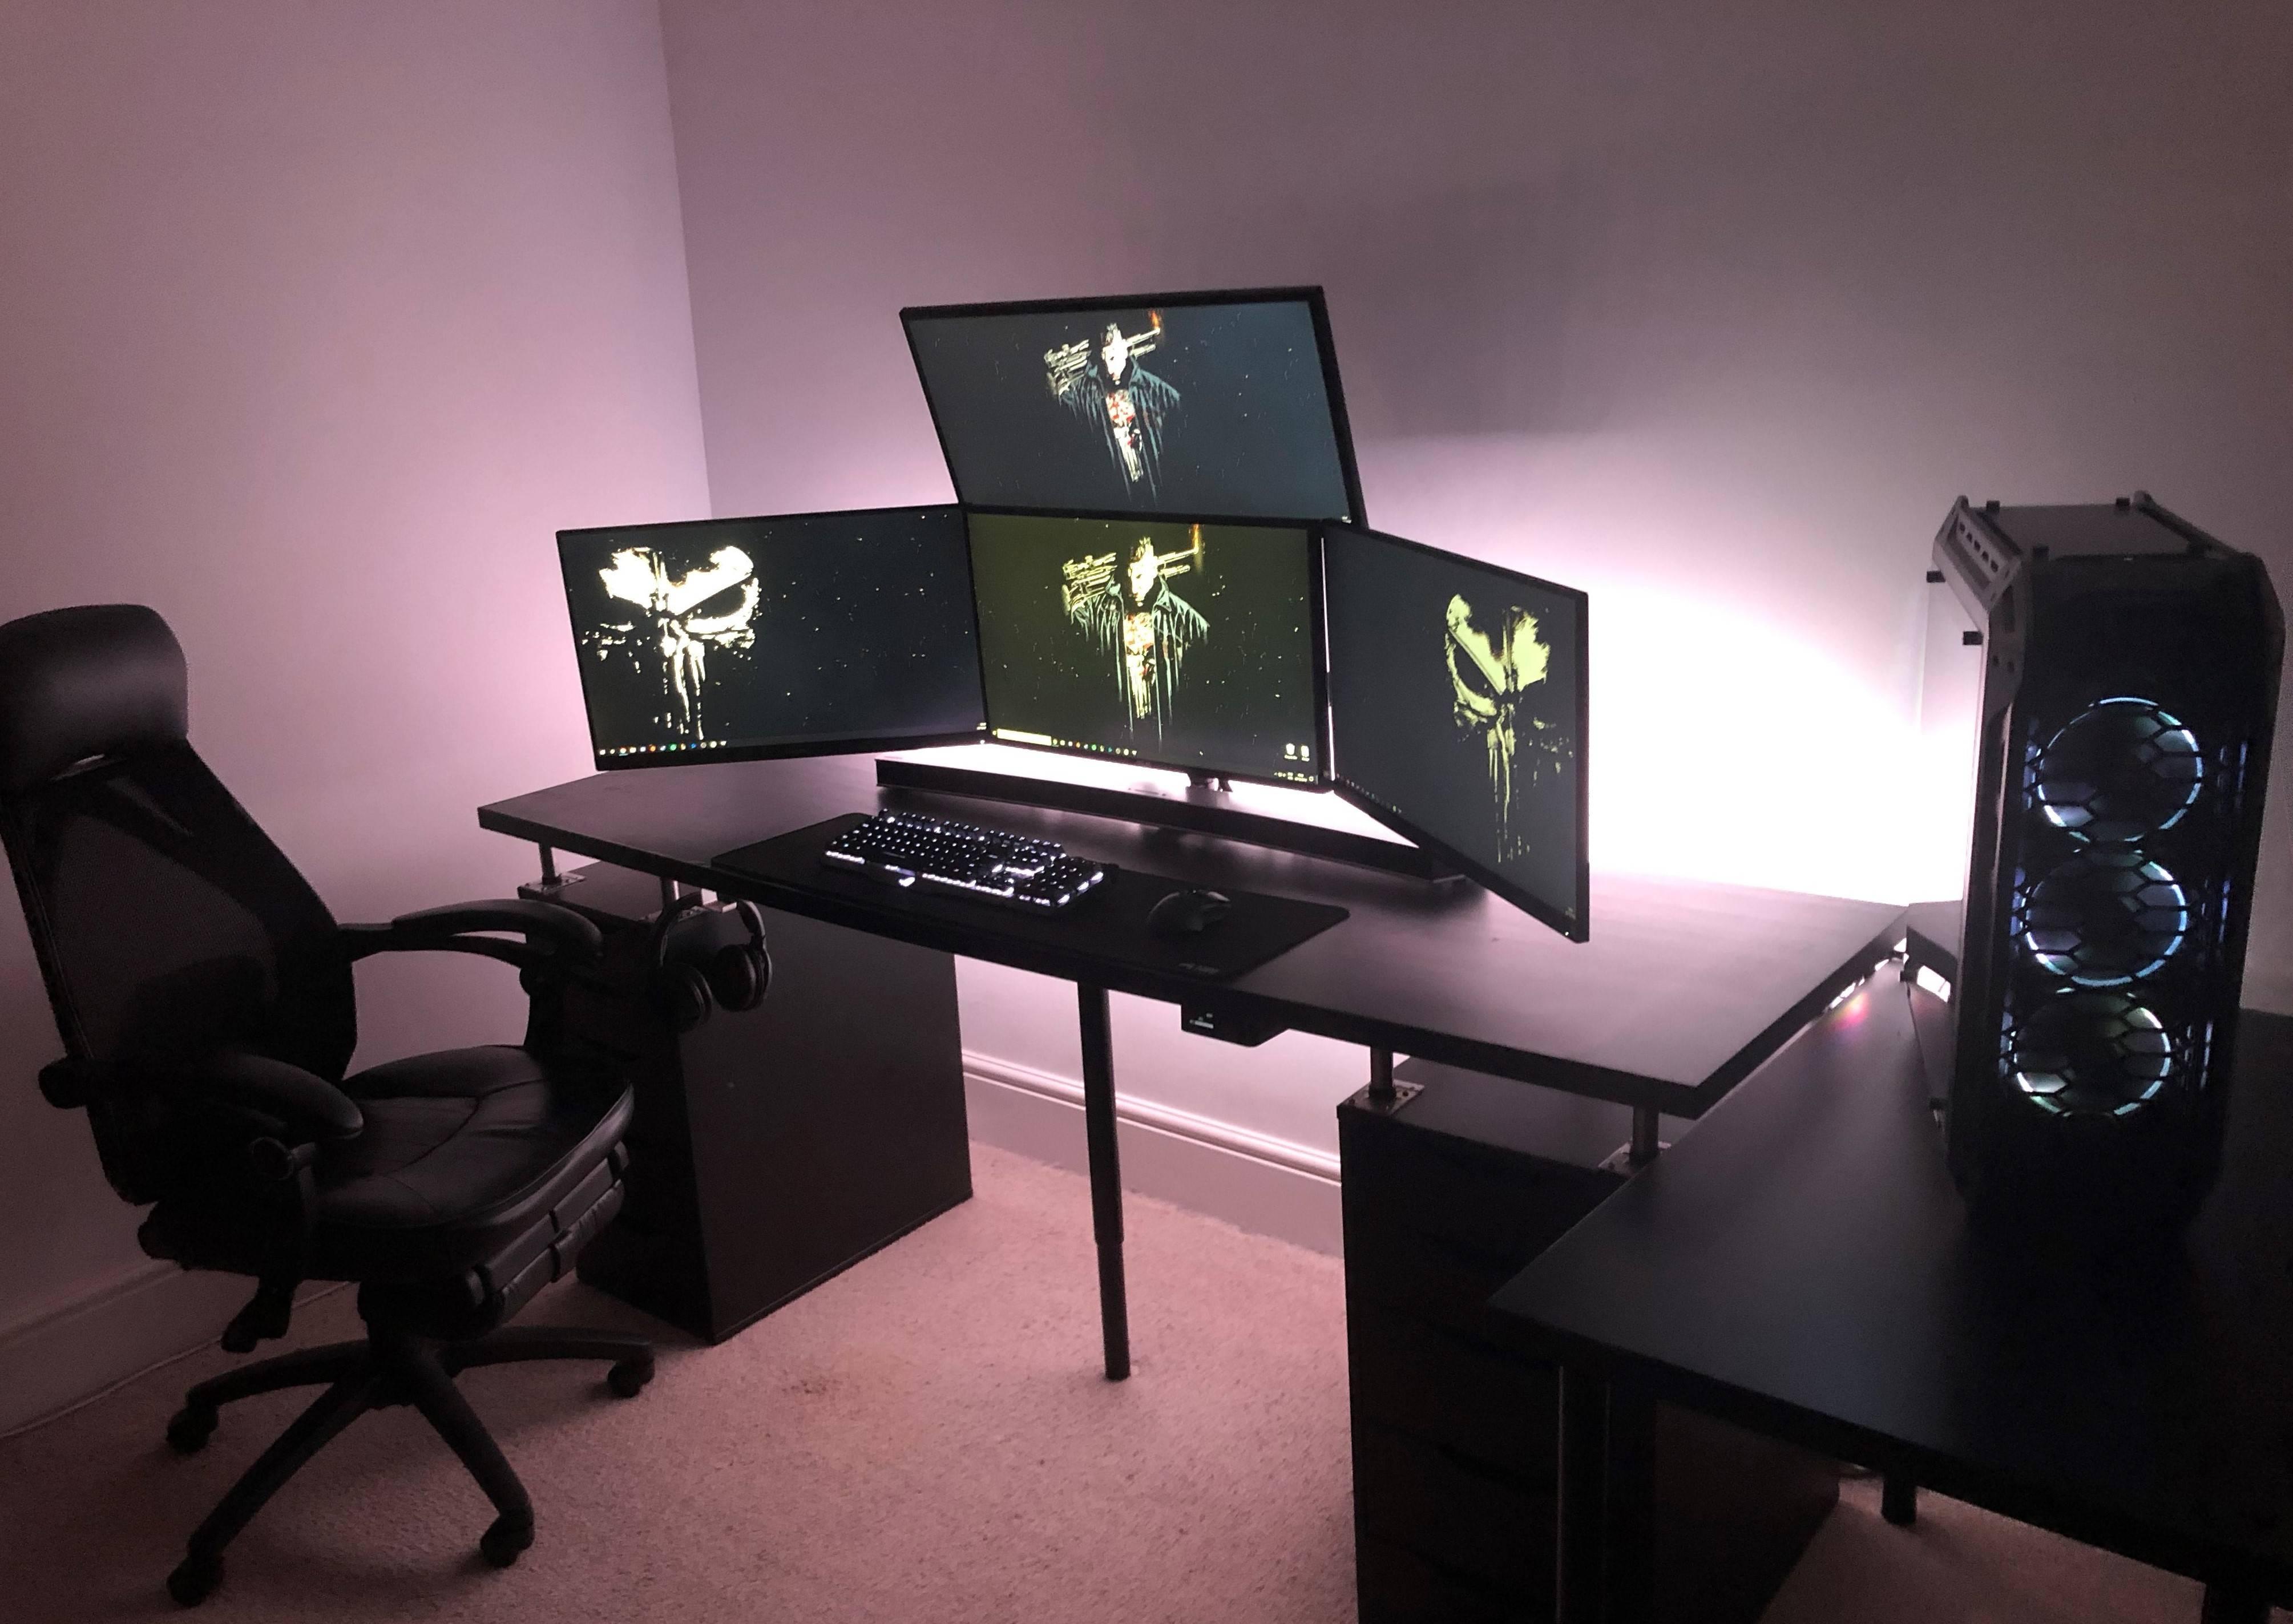 rjangervacio's Setup - The Punisher | Scooget